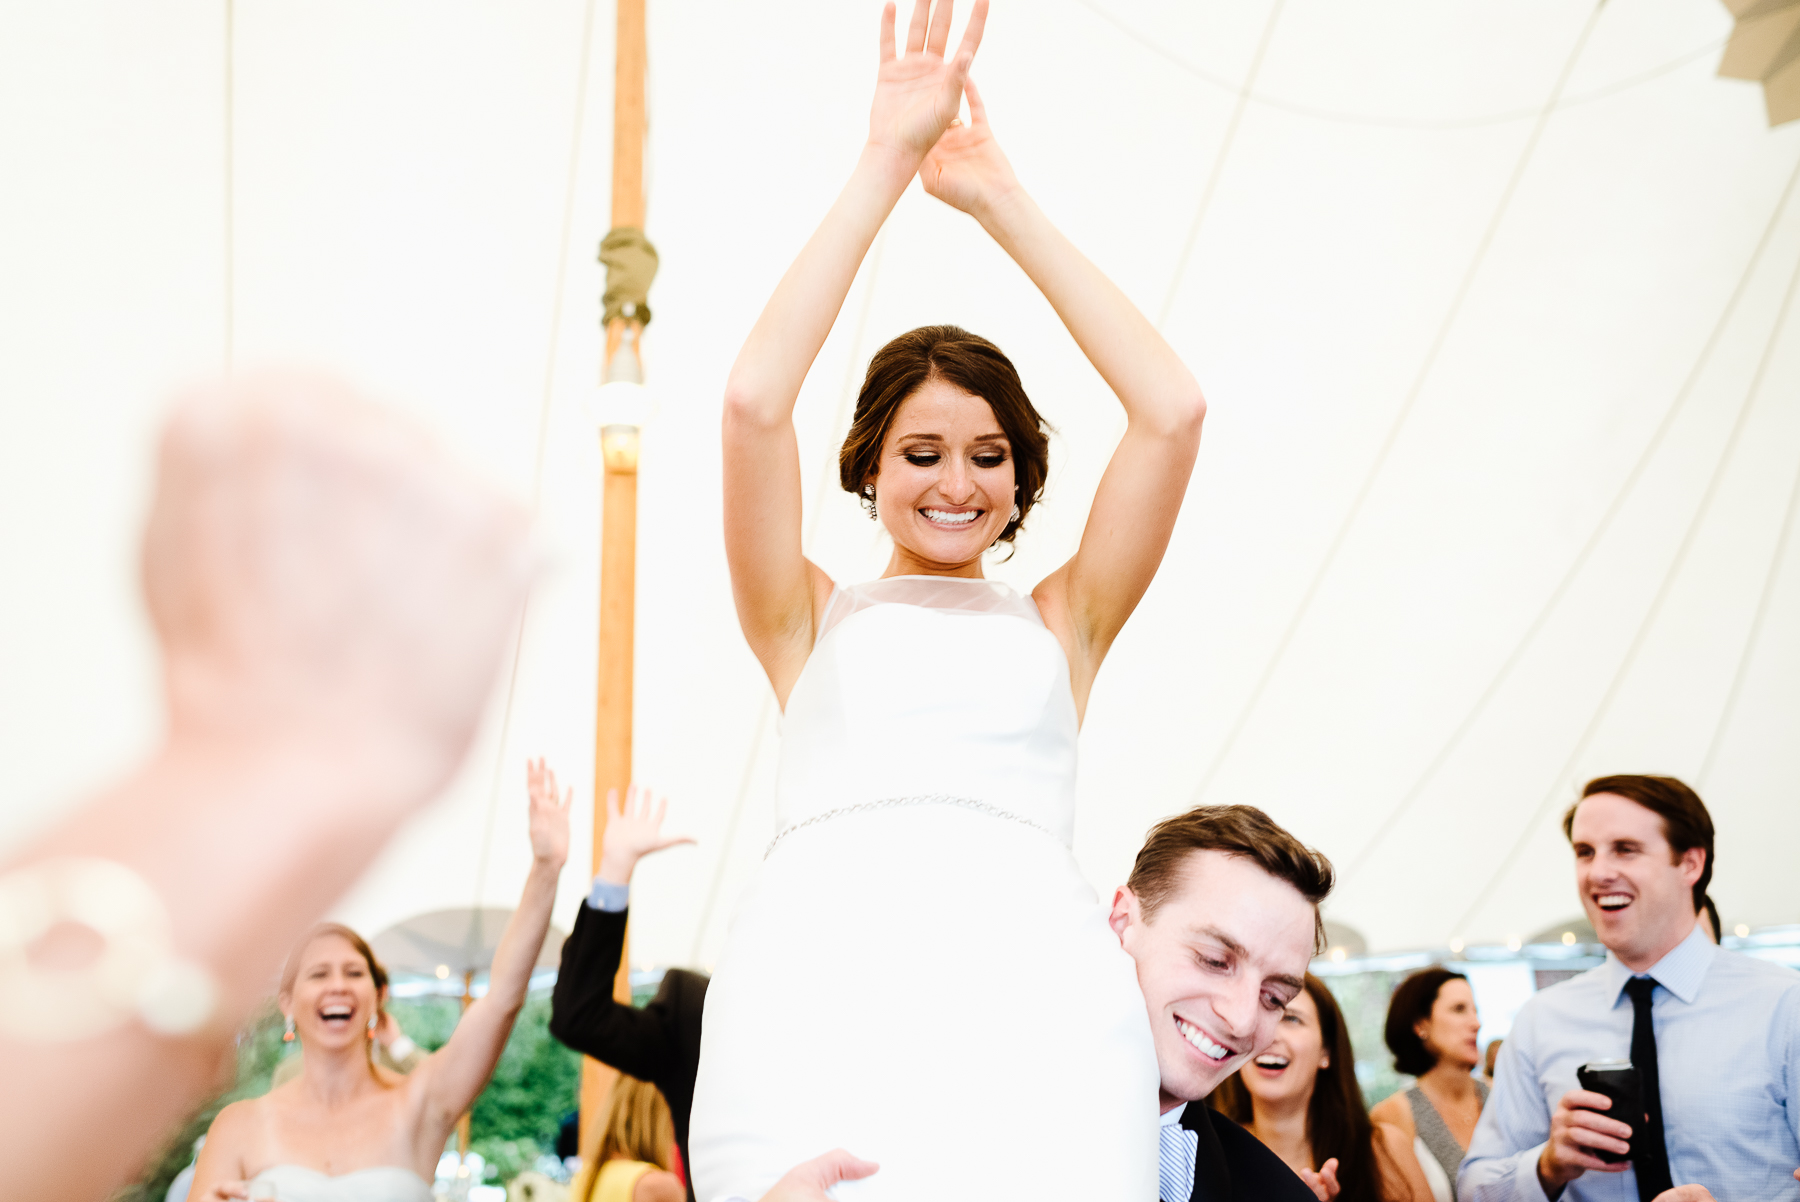 113-J Crew Wedding New Jersey Wedding Photographer J Crew Weddings.jpg